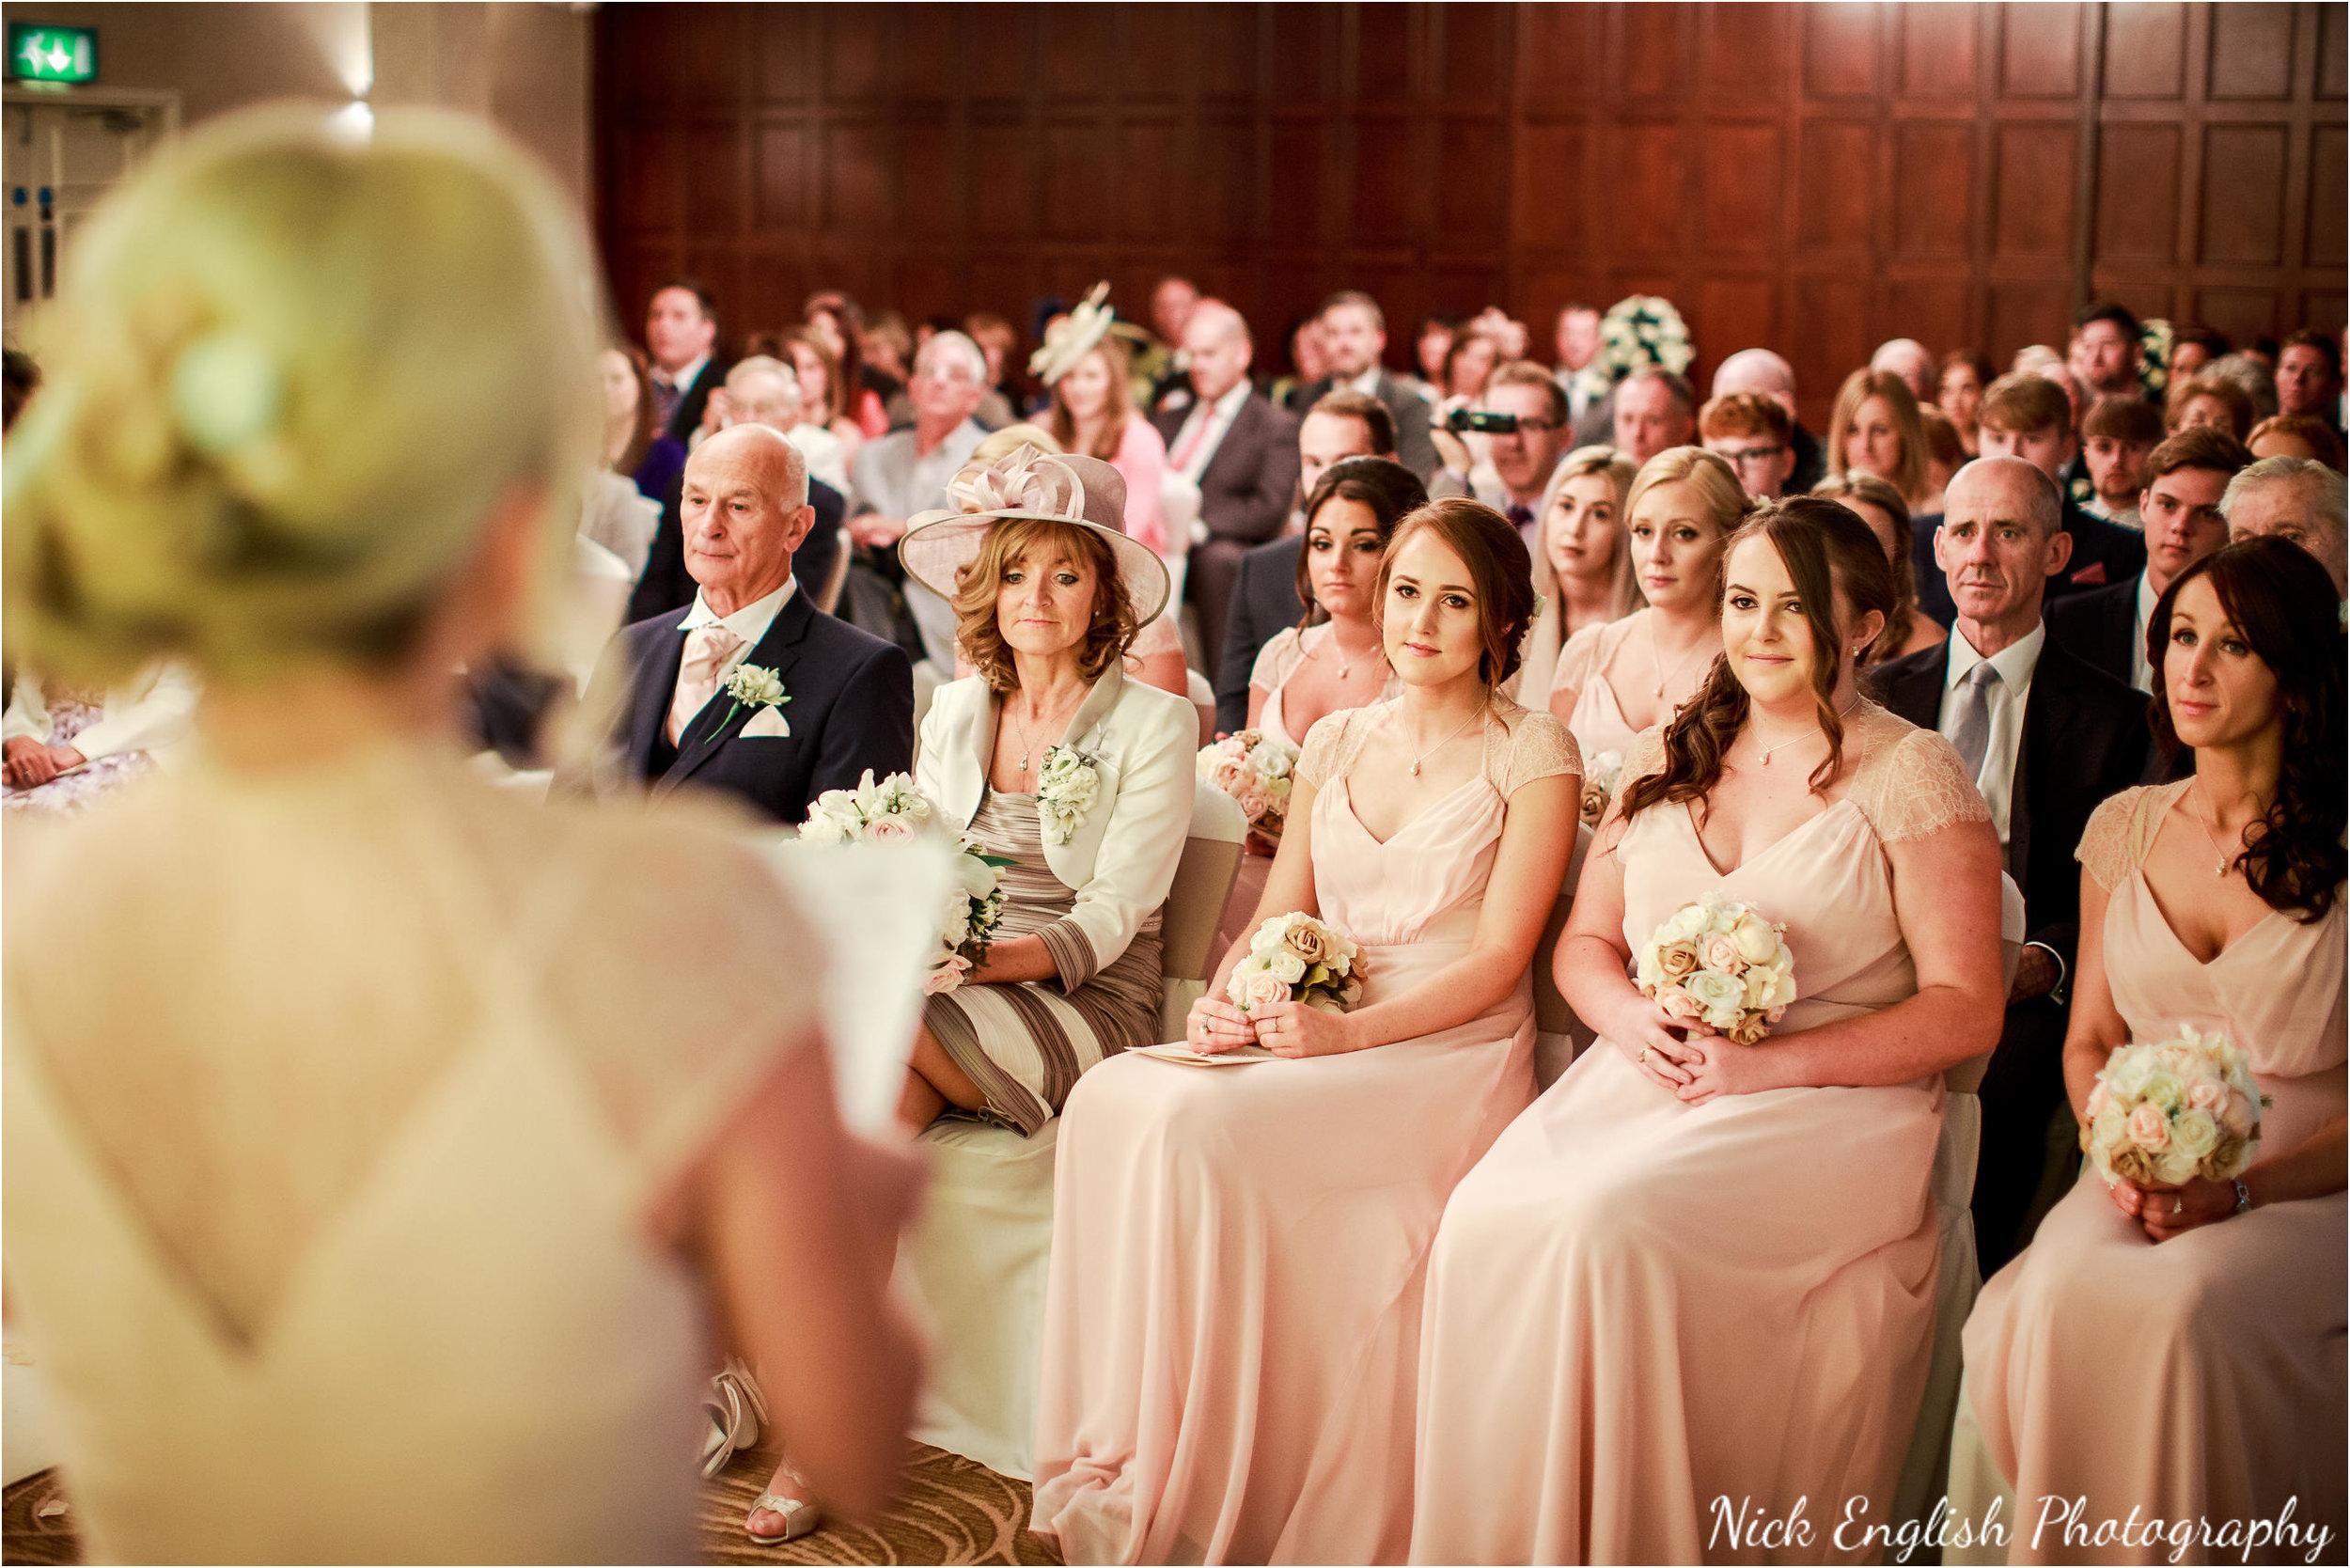 Emily David Wedding Photographs at Barton Grange Preston by Nick English Photography 80jpg.jpeg